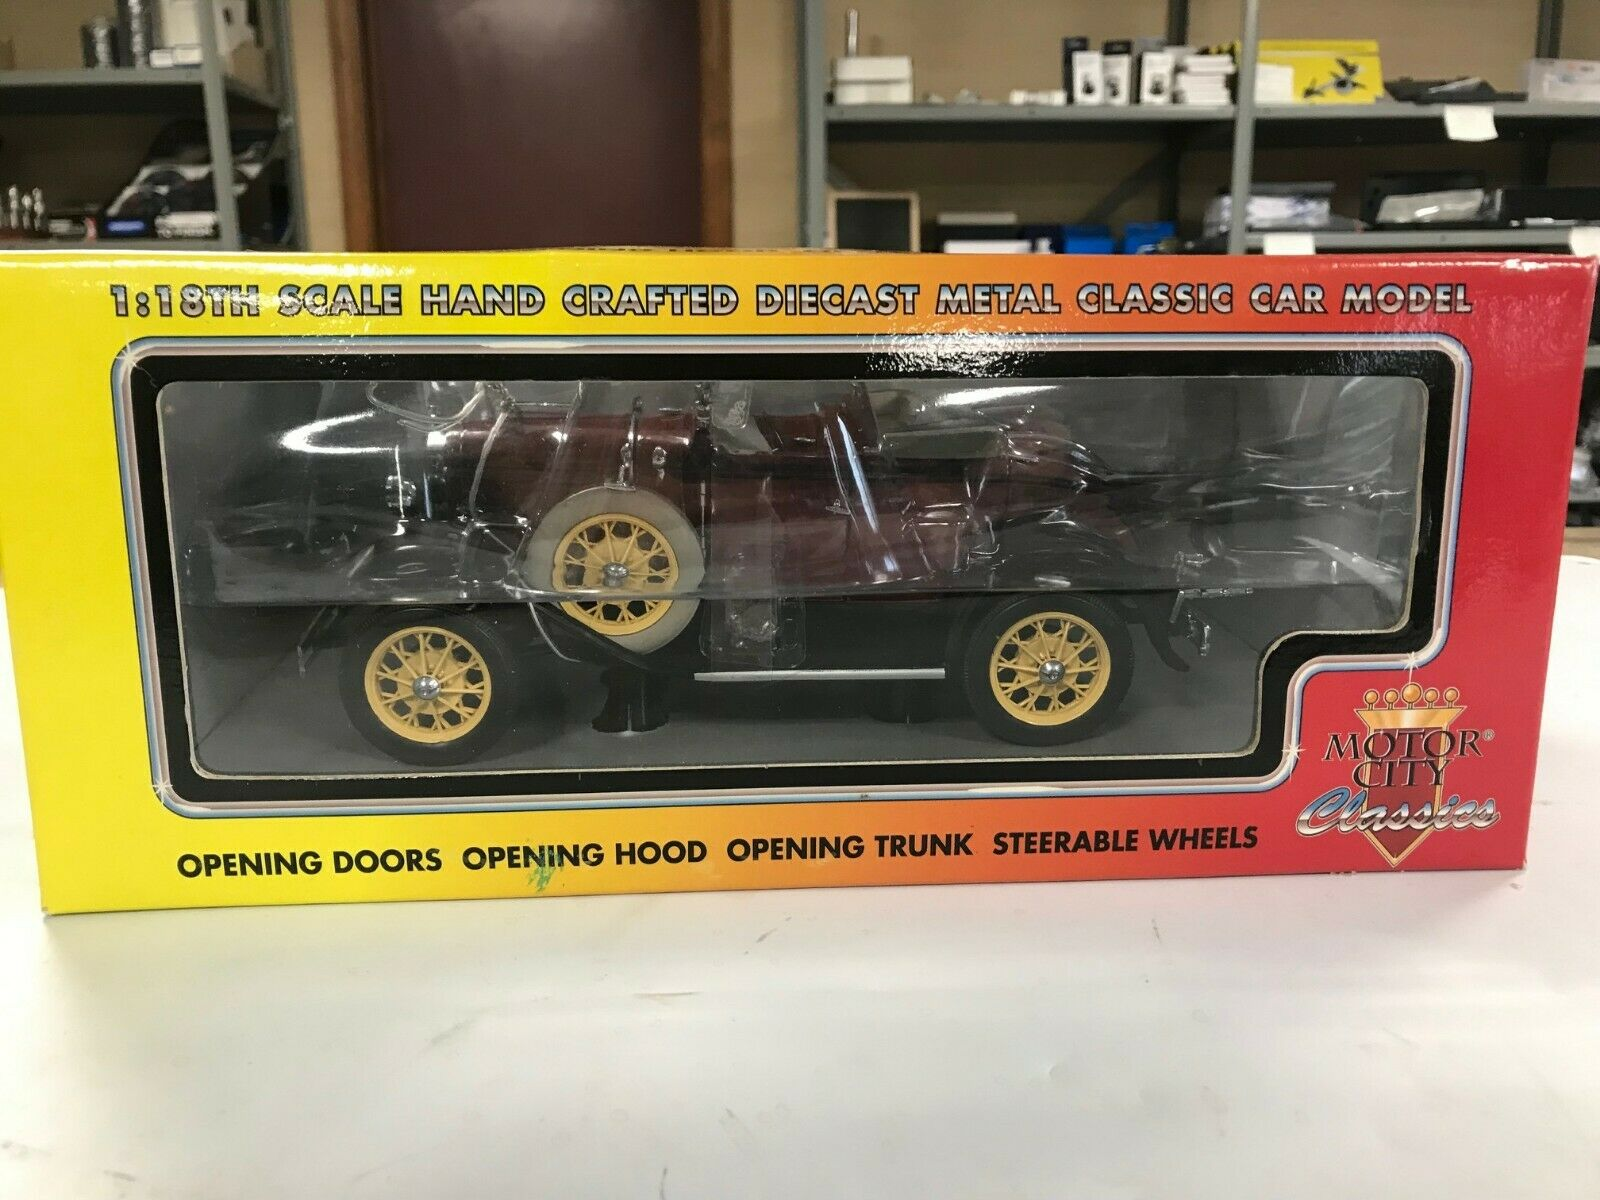 Motor City Classics 20009 1931 Ford Modelo A Escala 1 18TH Roadster, Nuevo En Caja